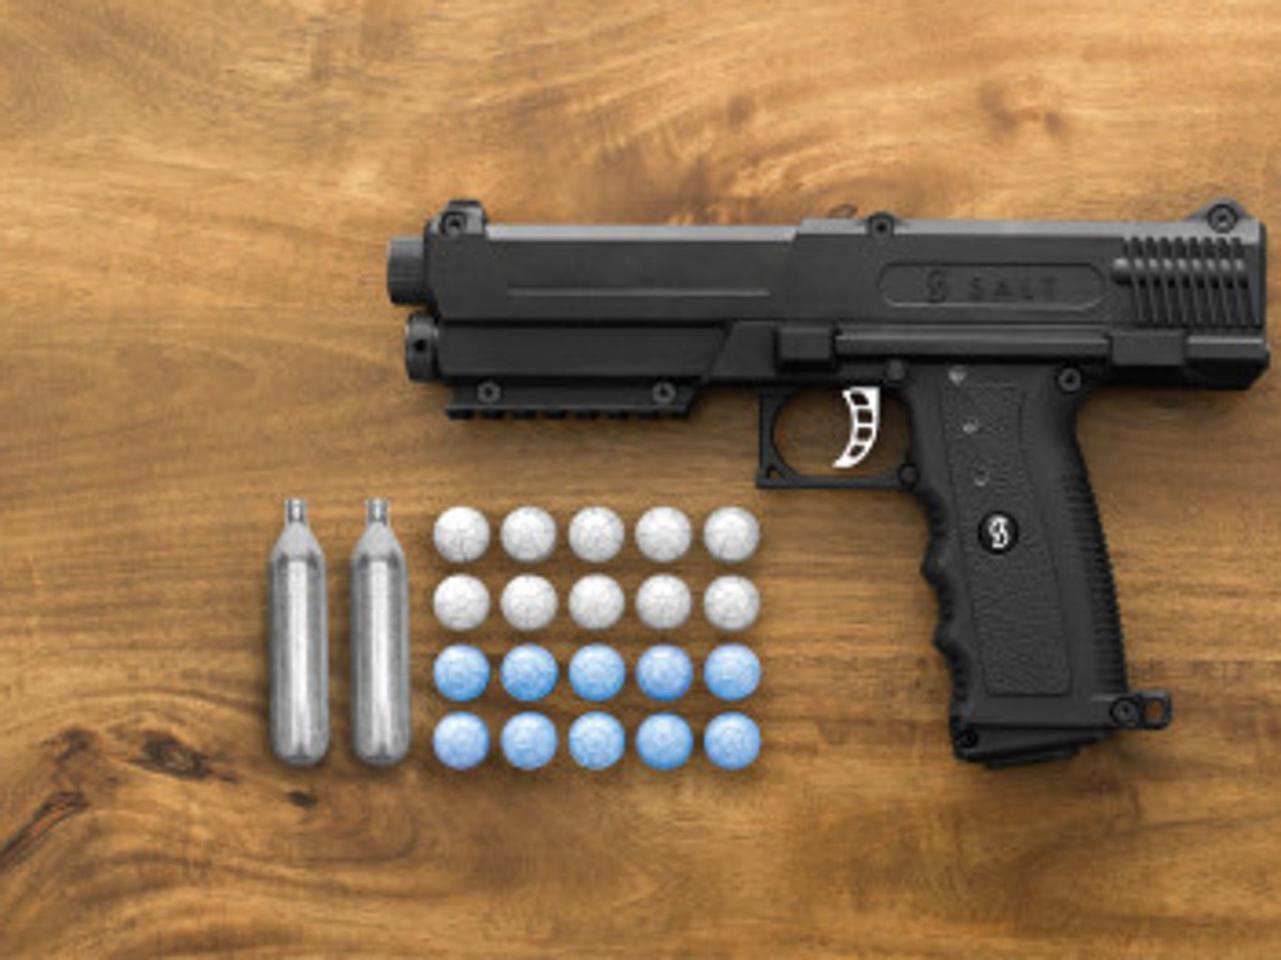 The Salt Gun fires incapacitating powder pellets instead of bullets